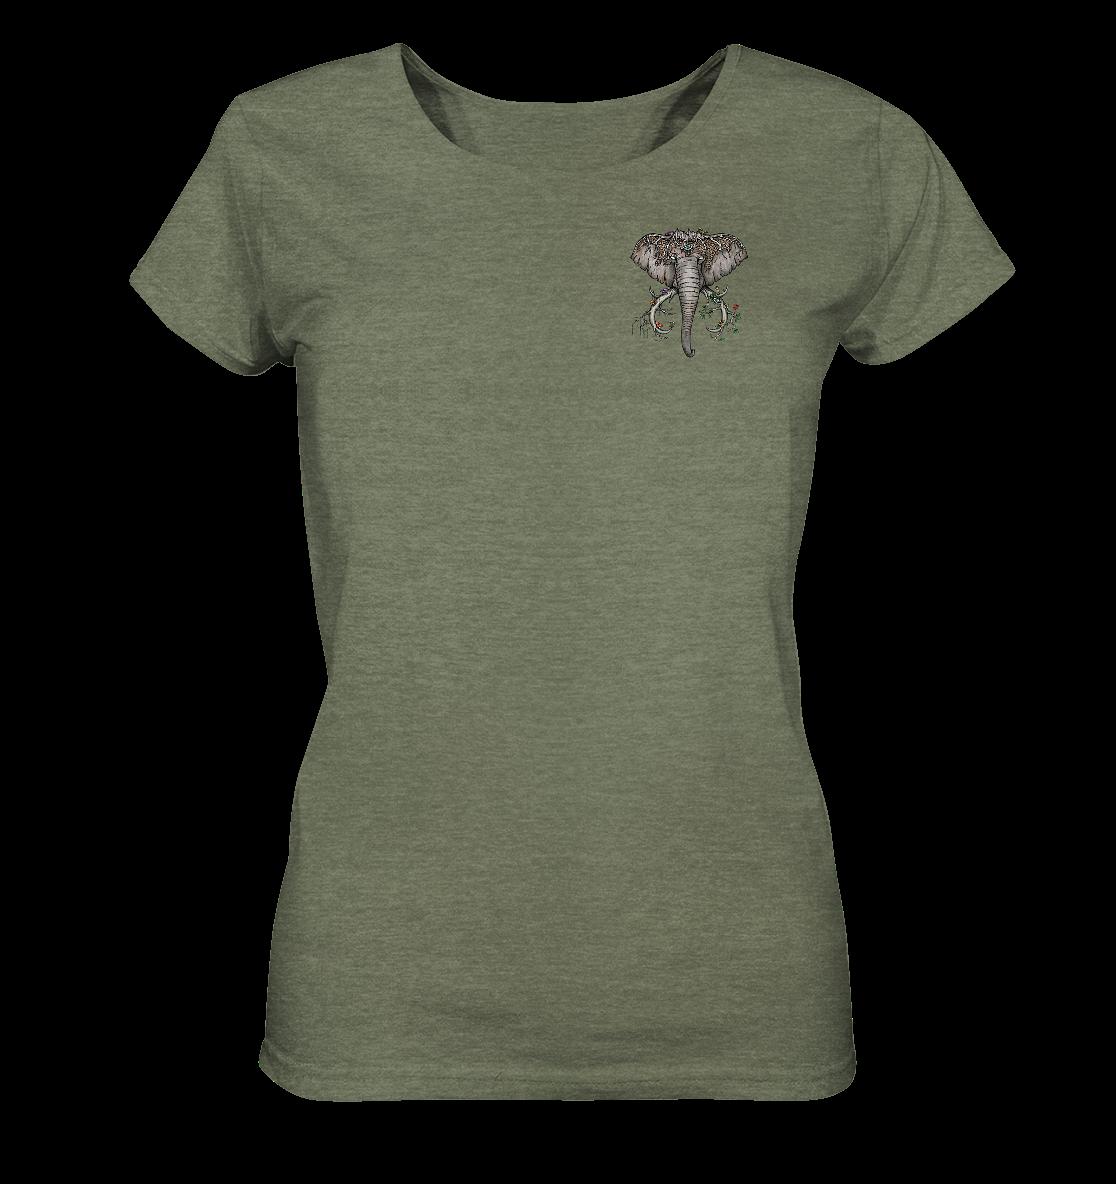 front-ladies-organic-shirt-meliert-616b52-1116x-2.png